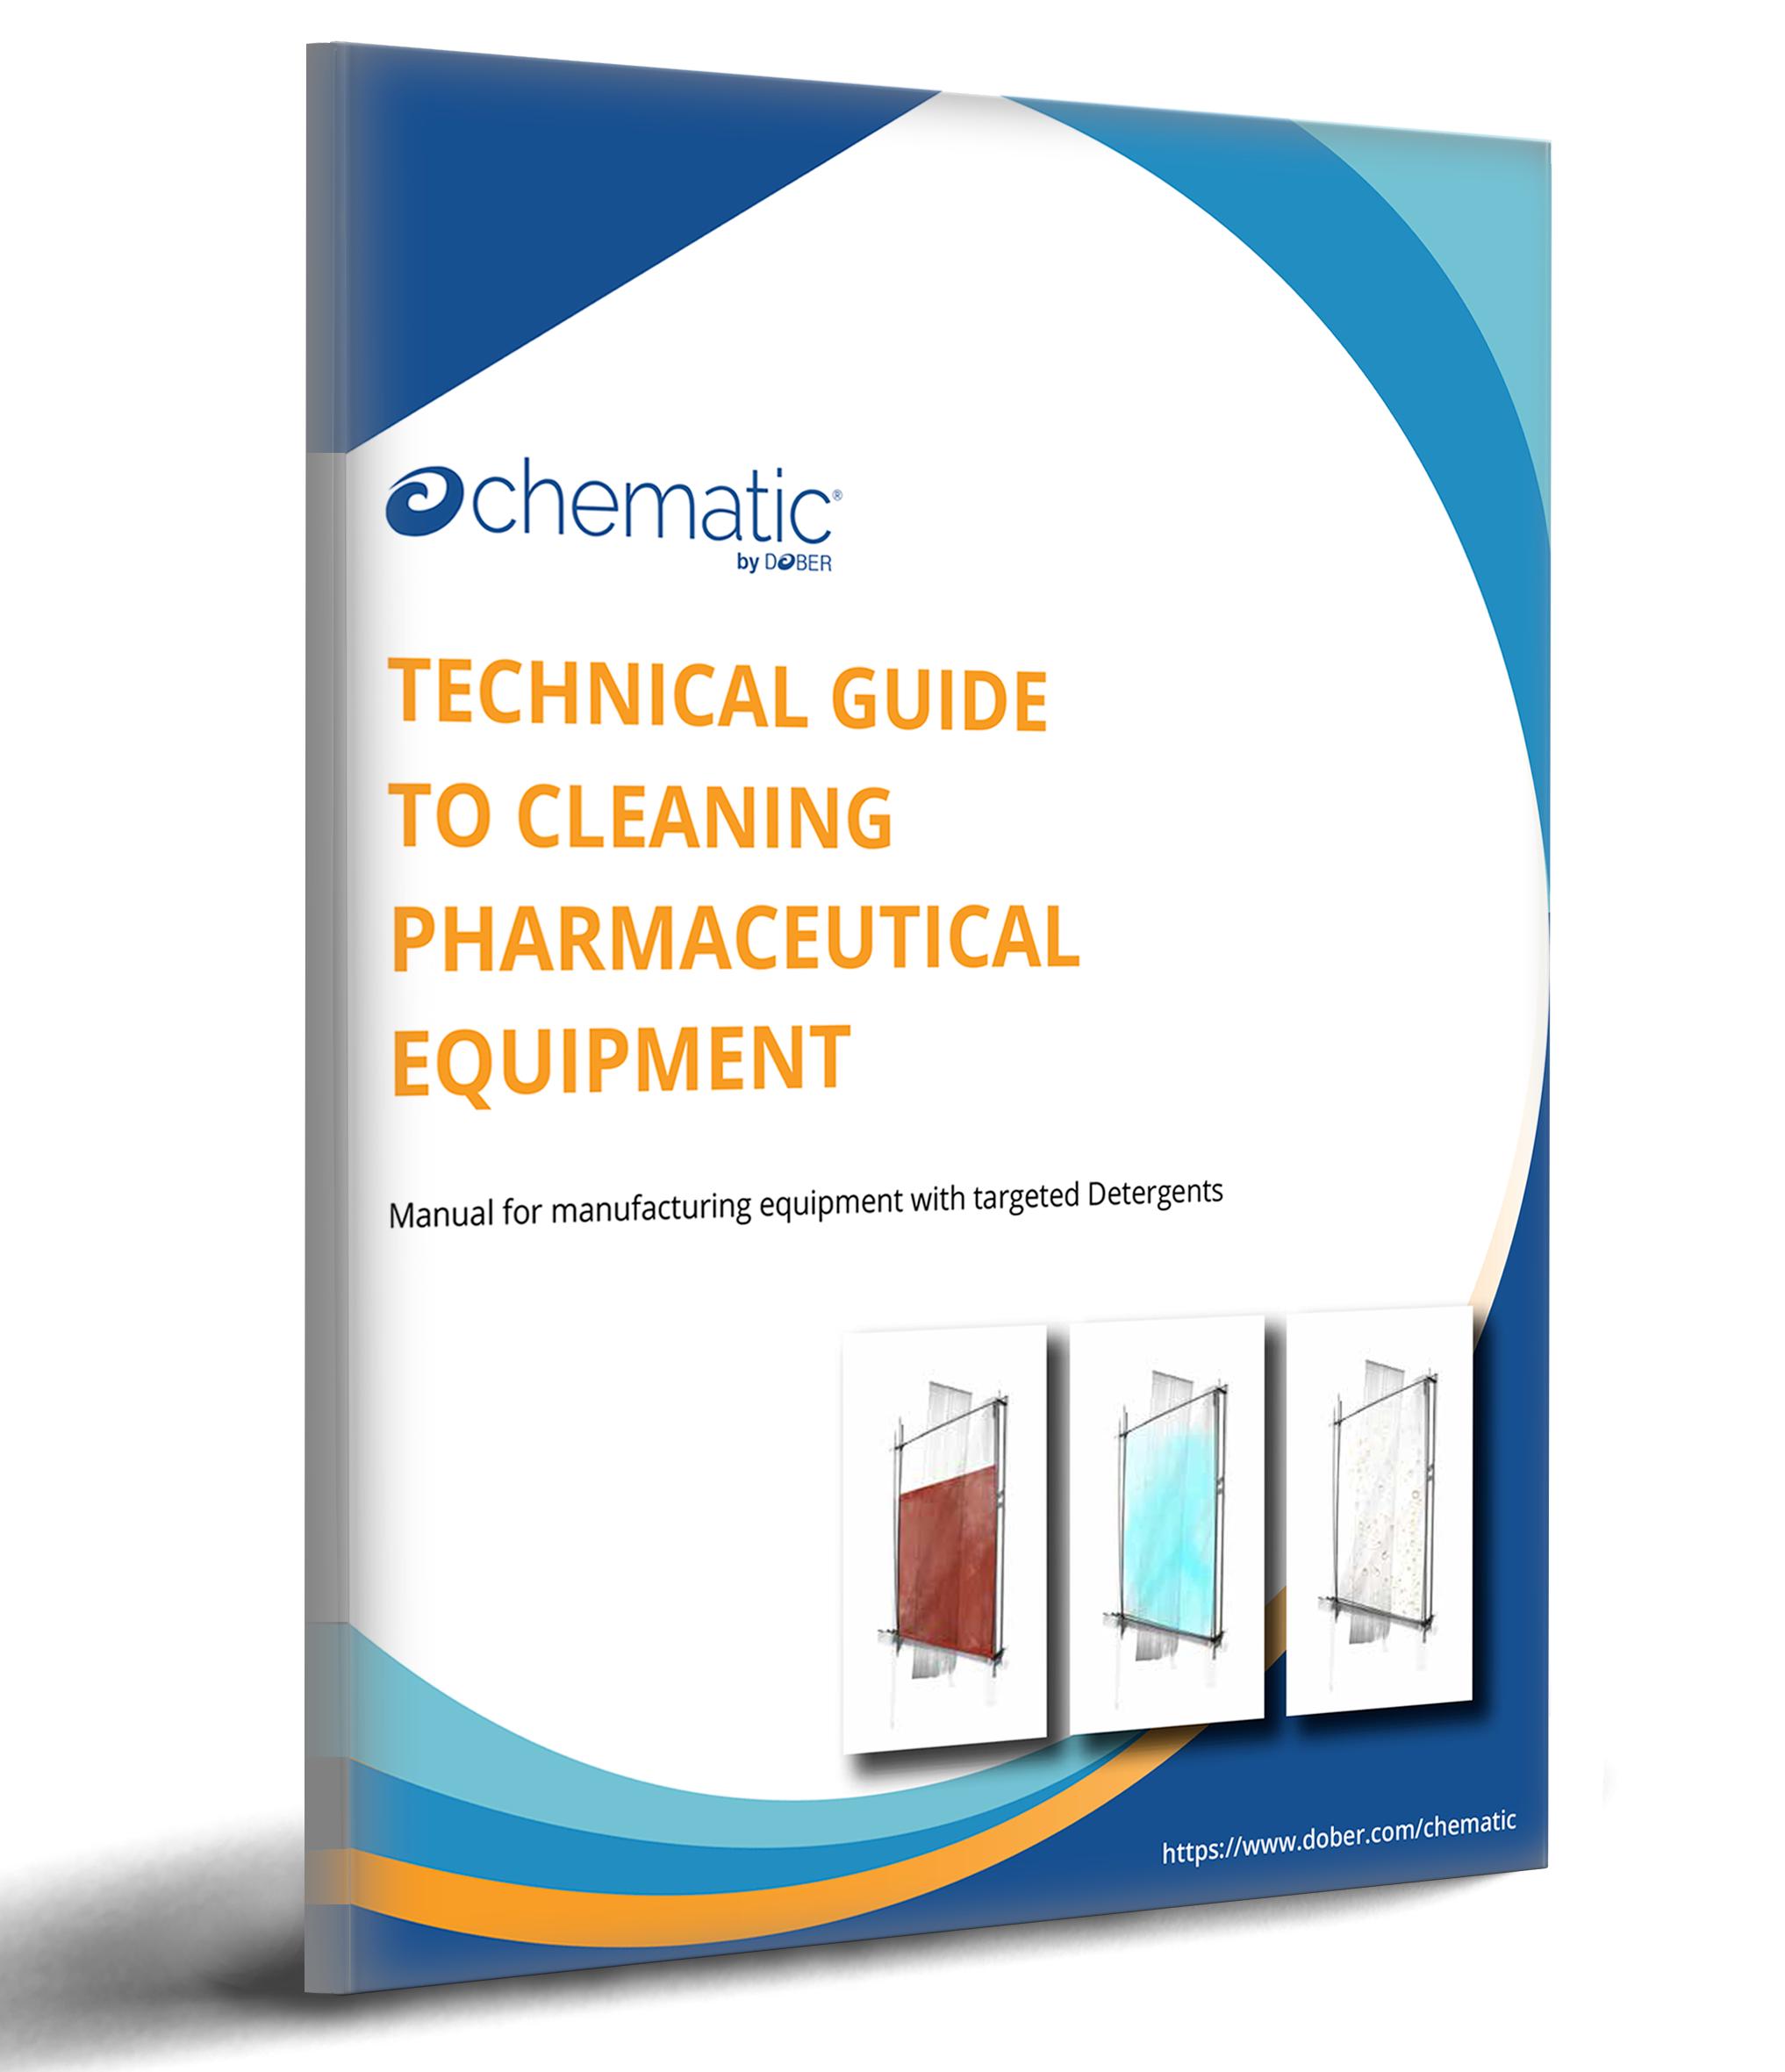 Chematic_Pharma_Equipment_Guide_Mirrored_DoberBlue